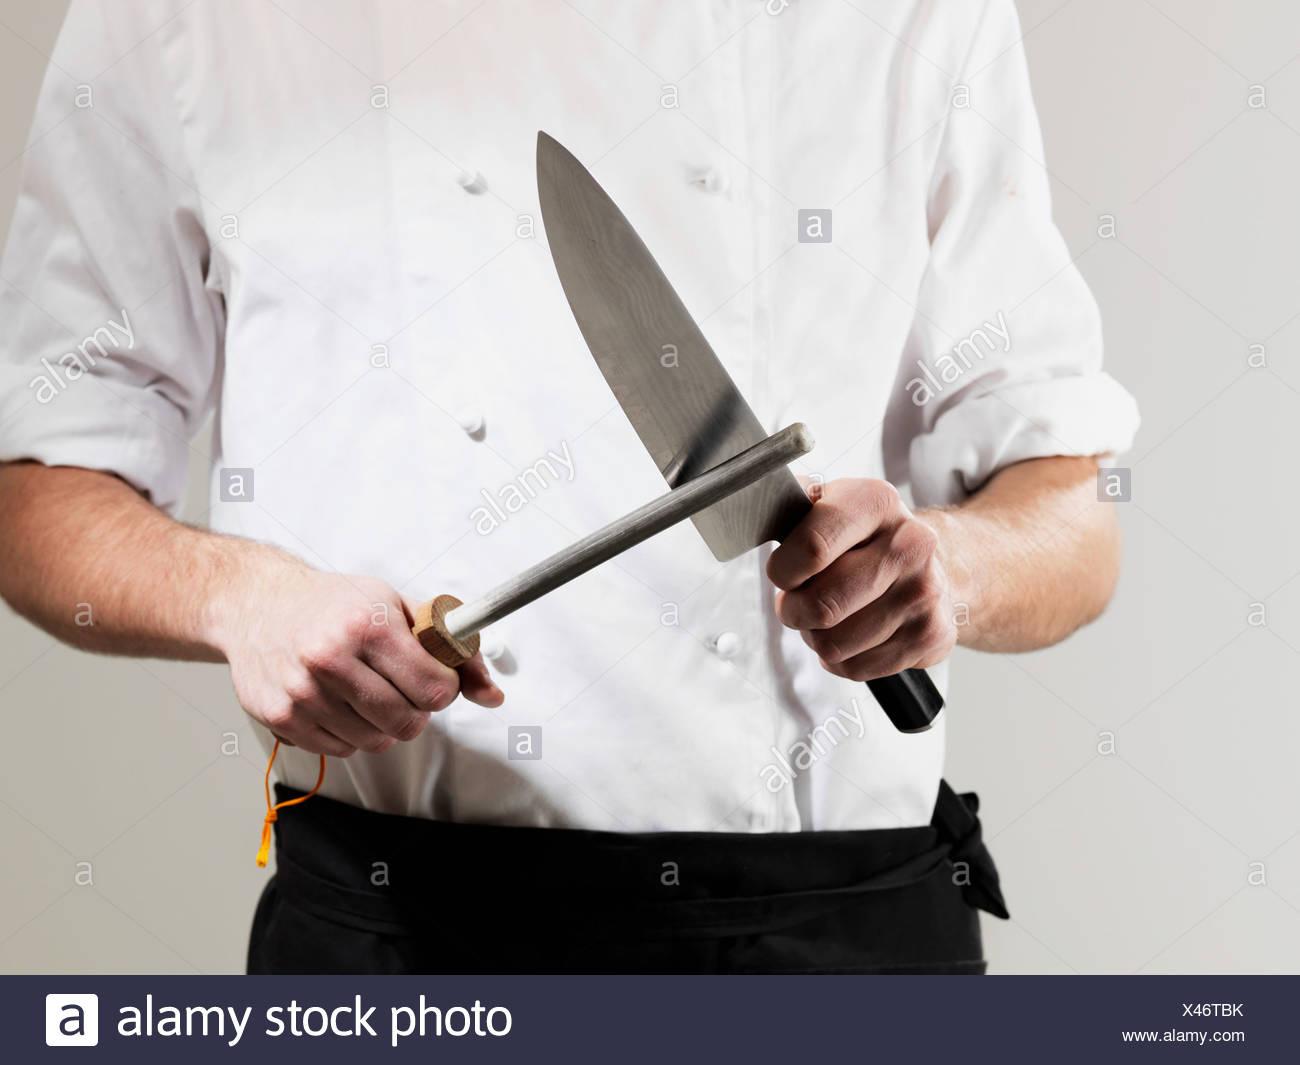 chef-sharpening-knife-against-white-background-X46TBK.jpg